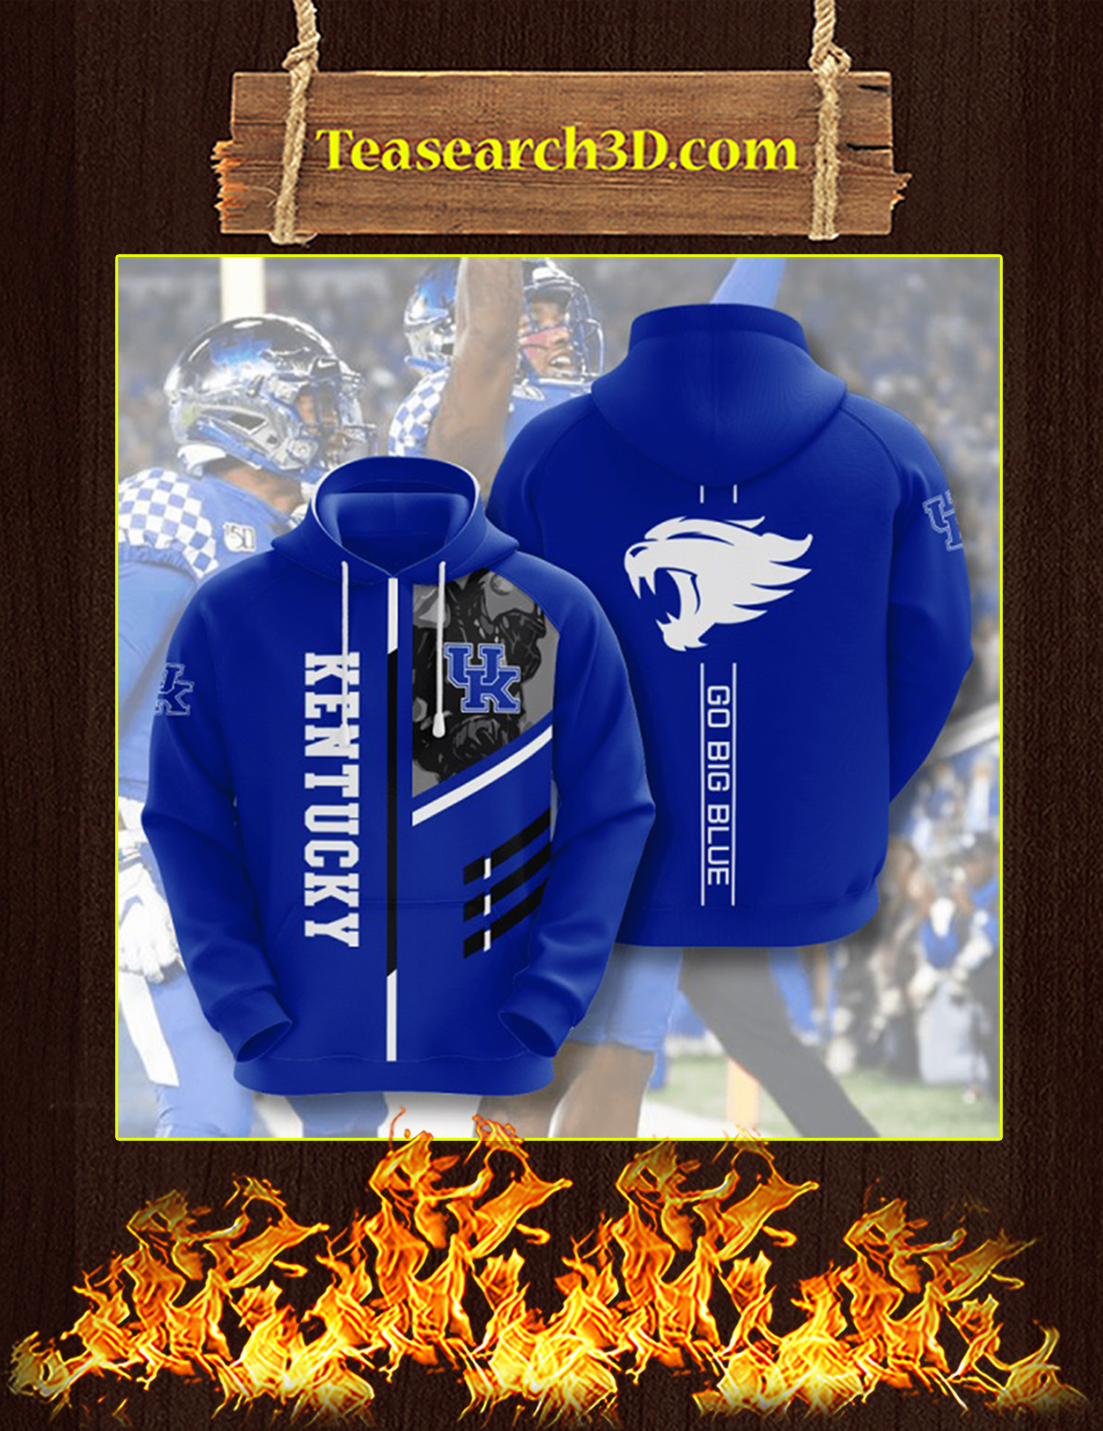 Go Big Blue Kentucky Wildcats 3D Hoodie Size L